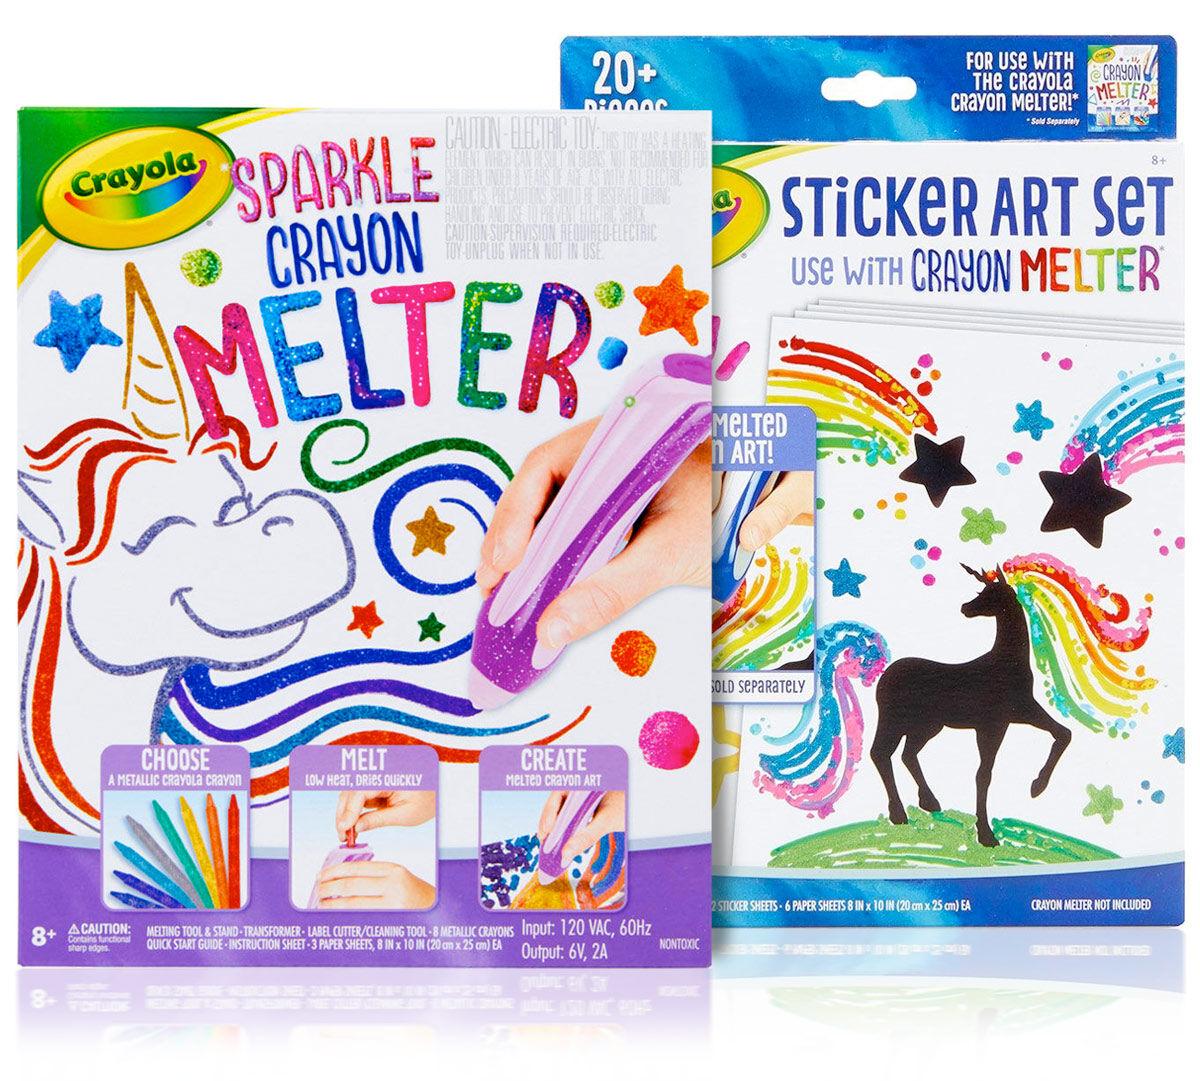 Sparkle Crayon Melter with Sticker Art Set